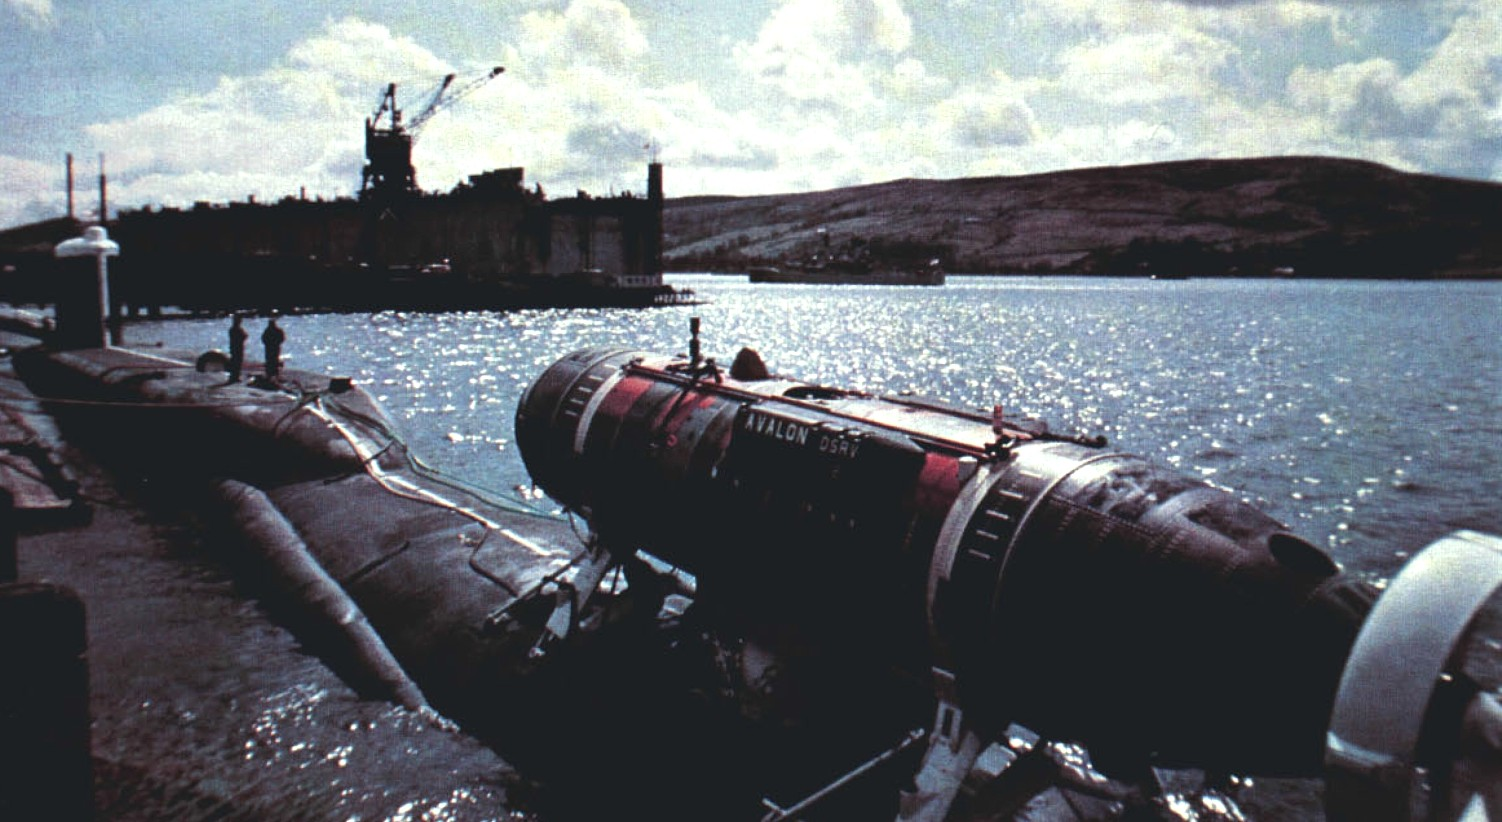 Resolution class Ballistic Missile Submarine SSBN - Royal Navy